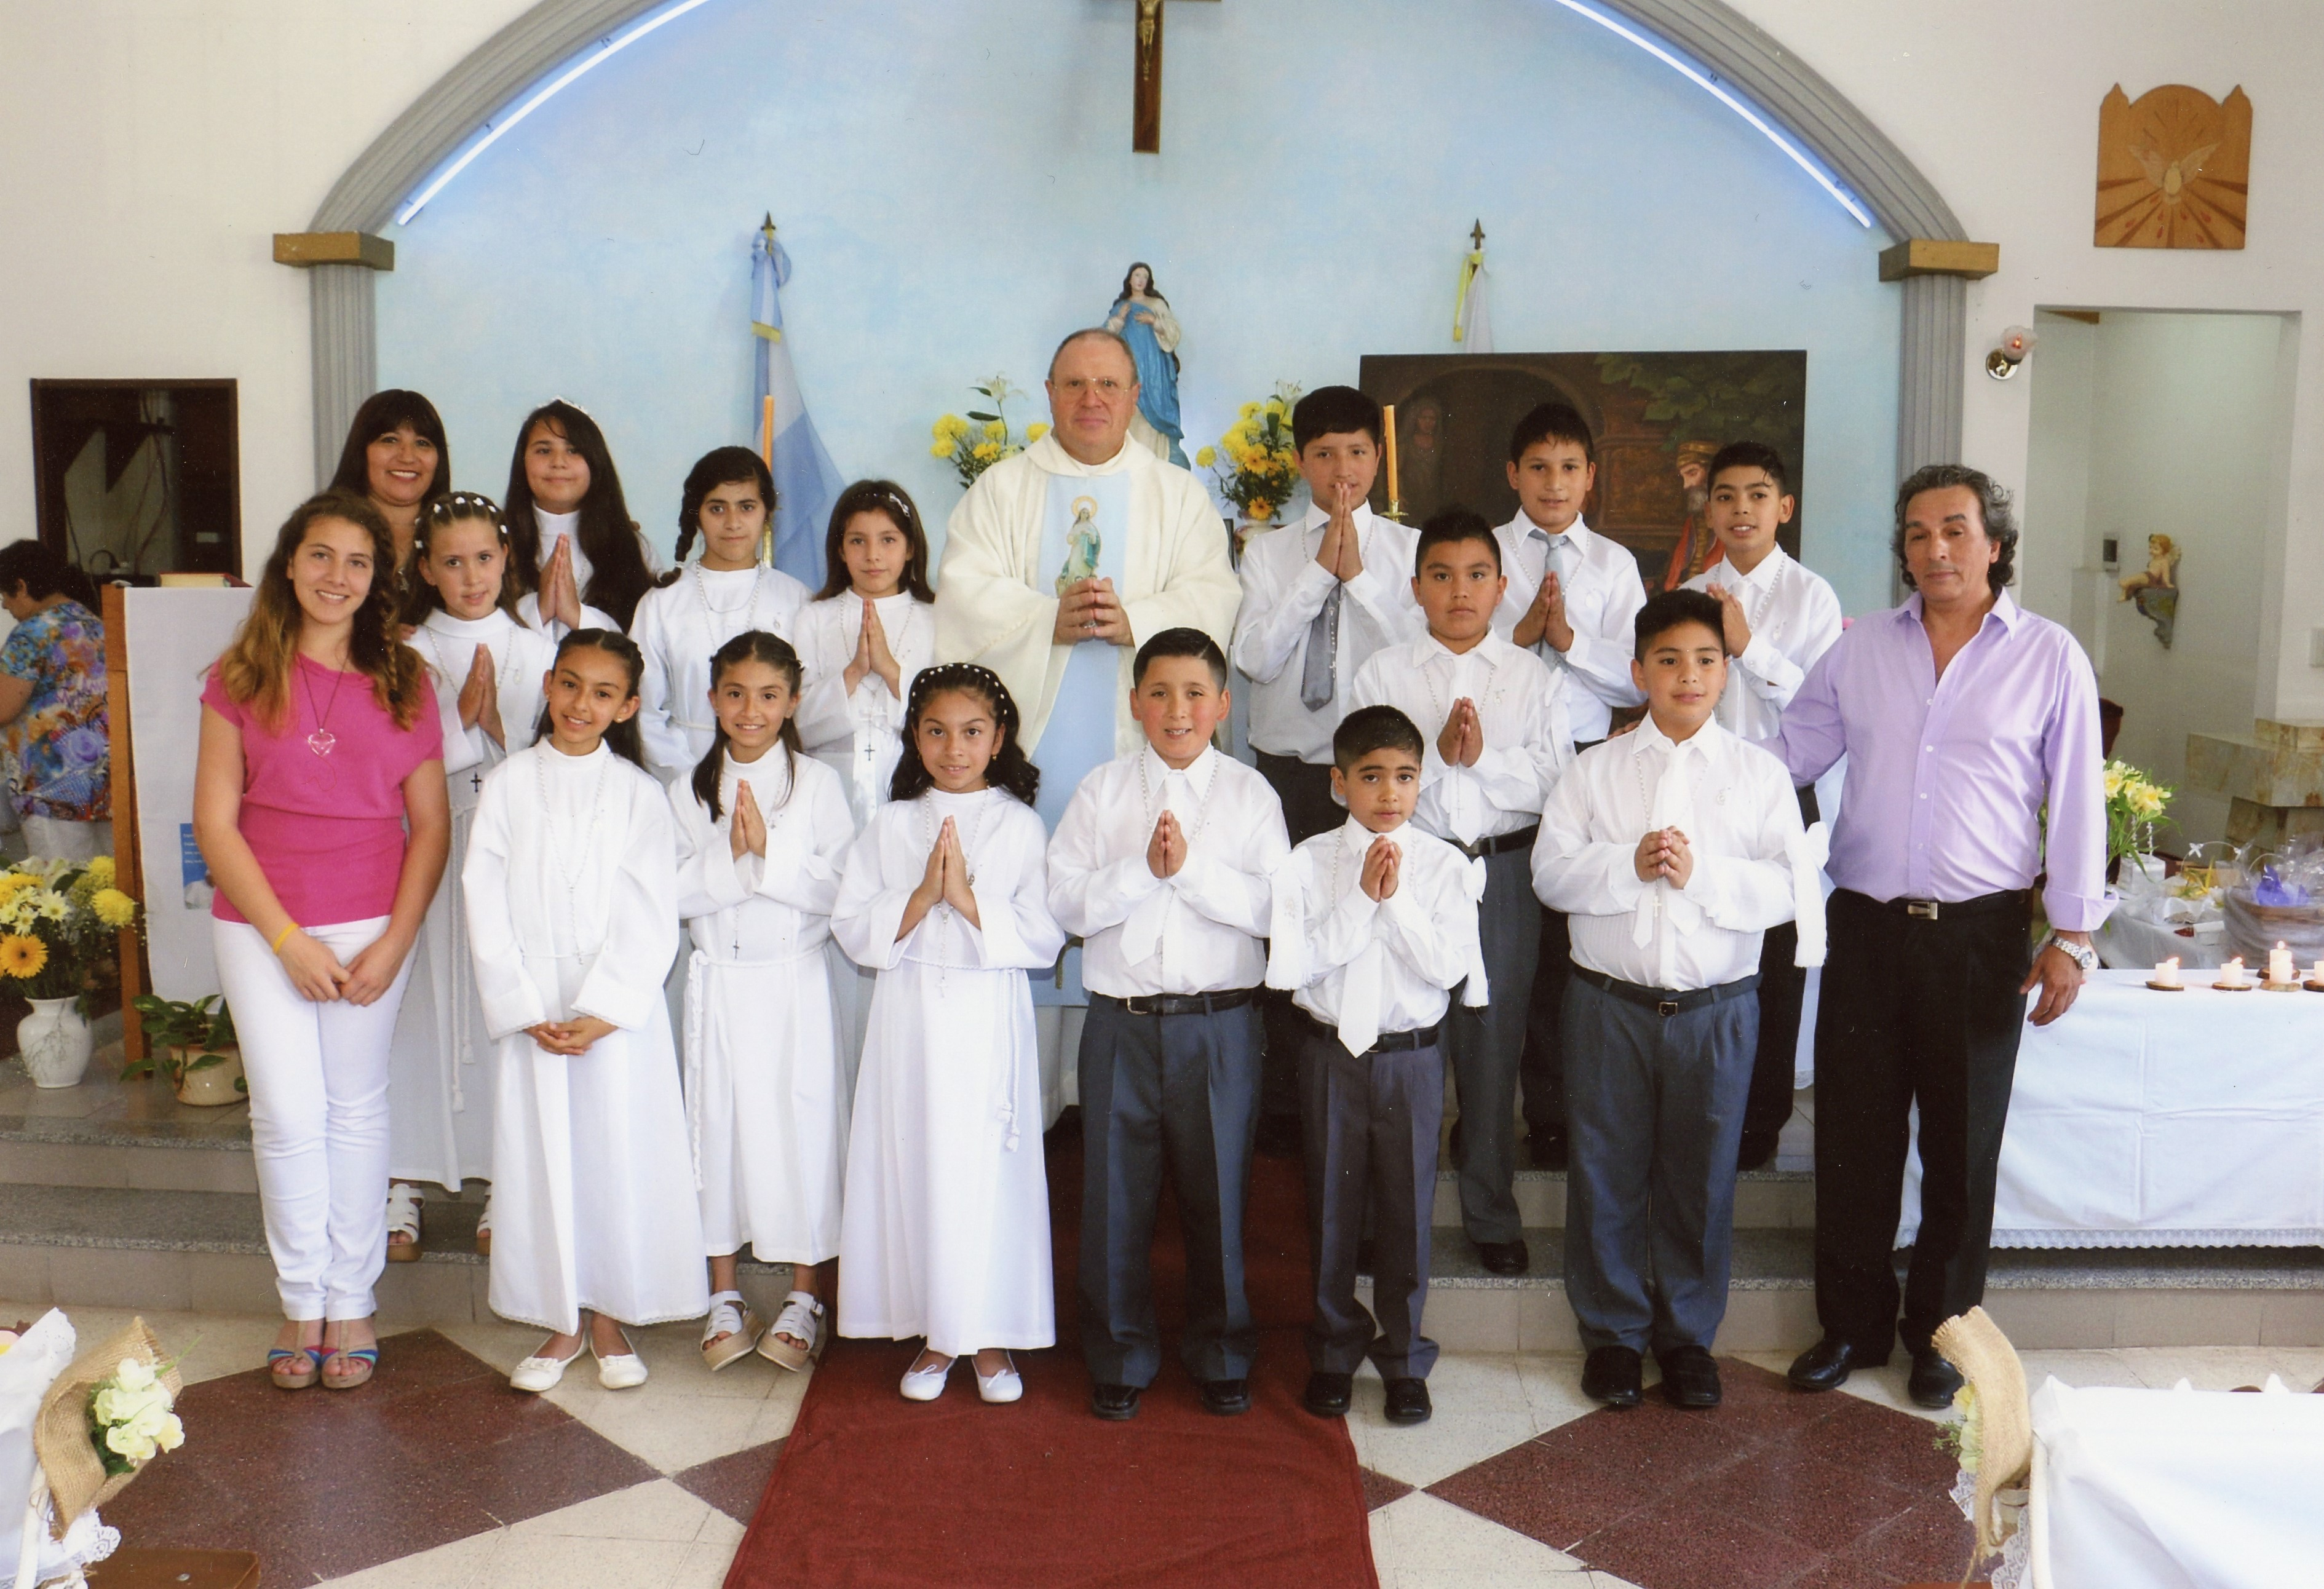 Proyecto: Una capilla para la parroquia de Cristo Obrero en Argentina